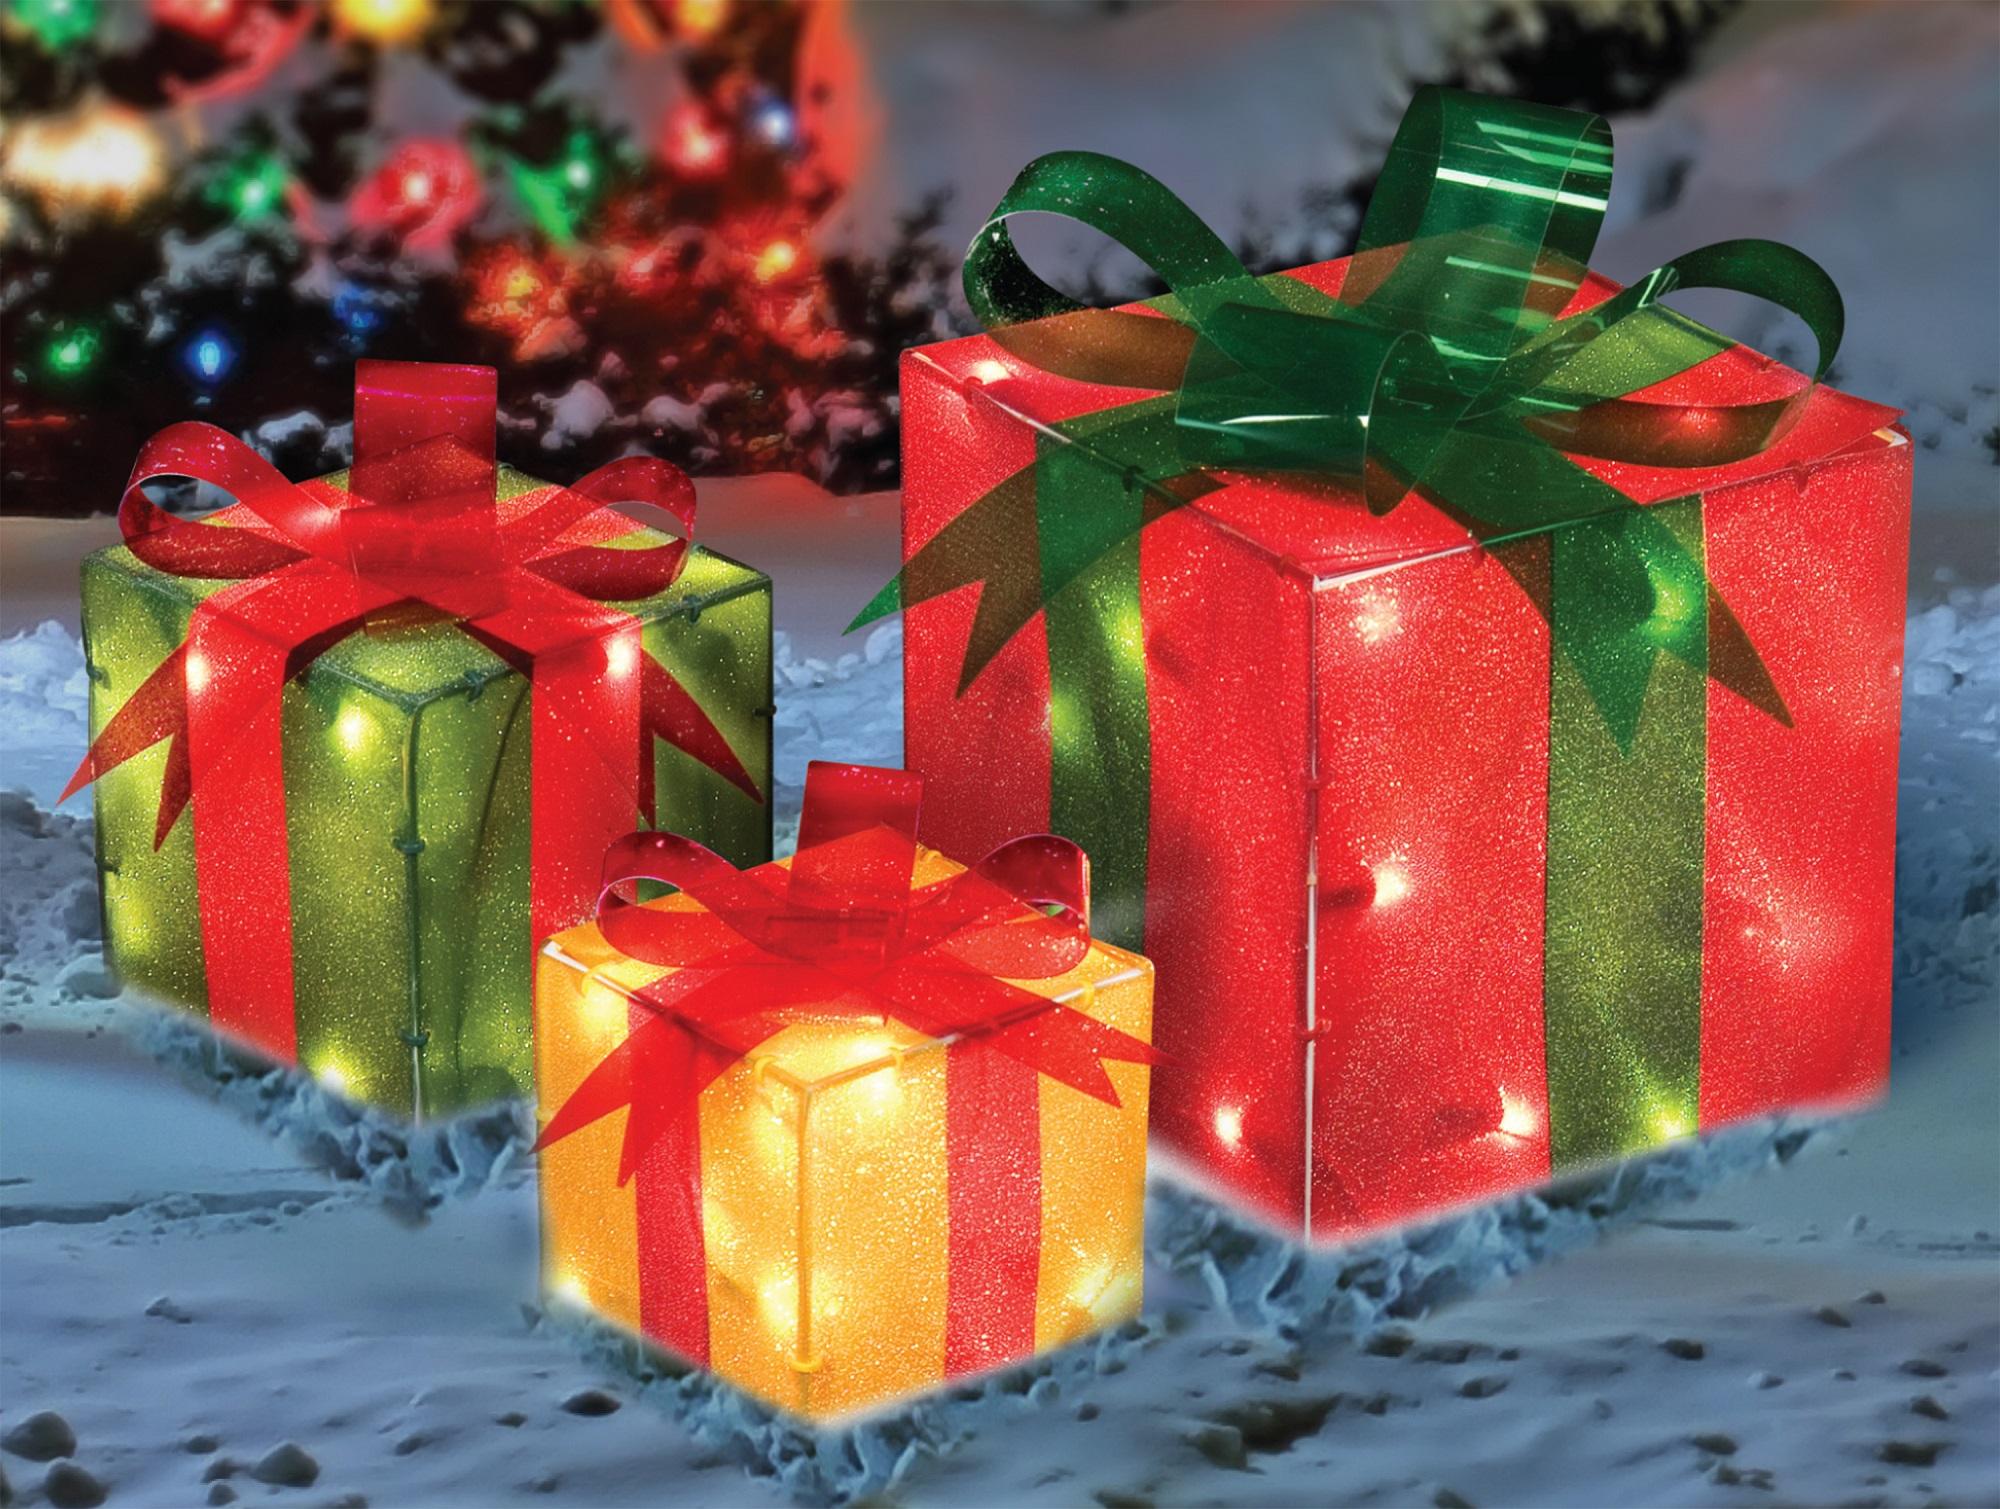 Northlight Set of 3 Lighted Glistening Gift Box Christmas Outdoor ...